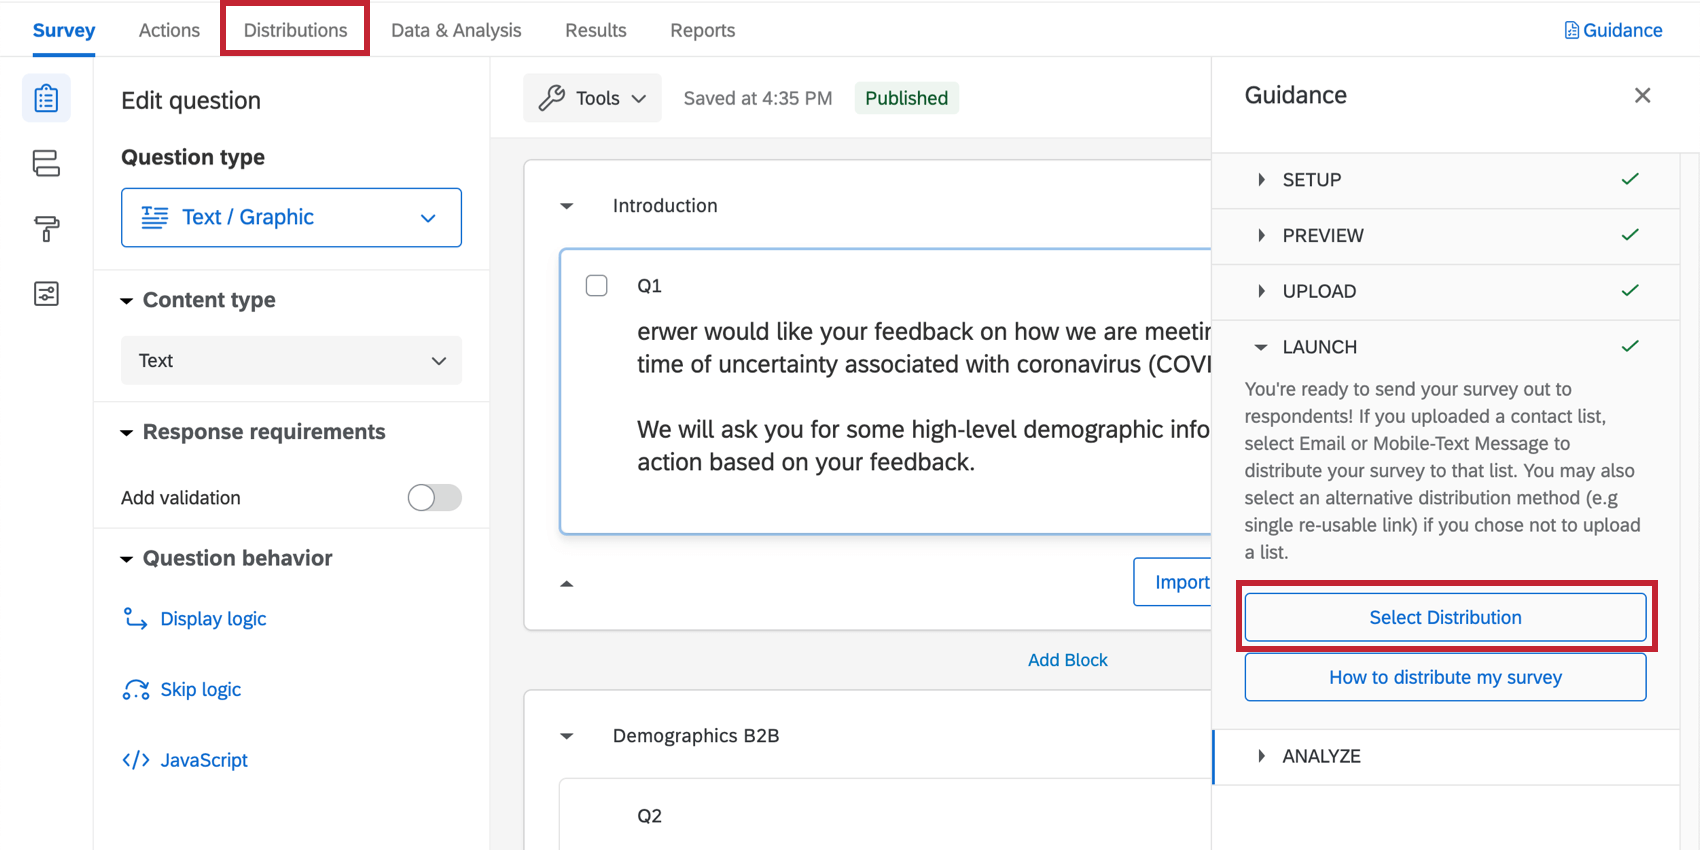 clicking select distribution, or navigating to the distribution tab